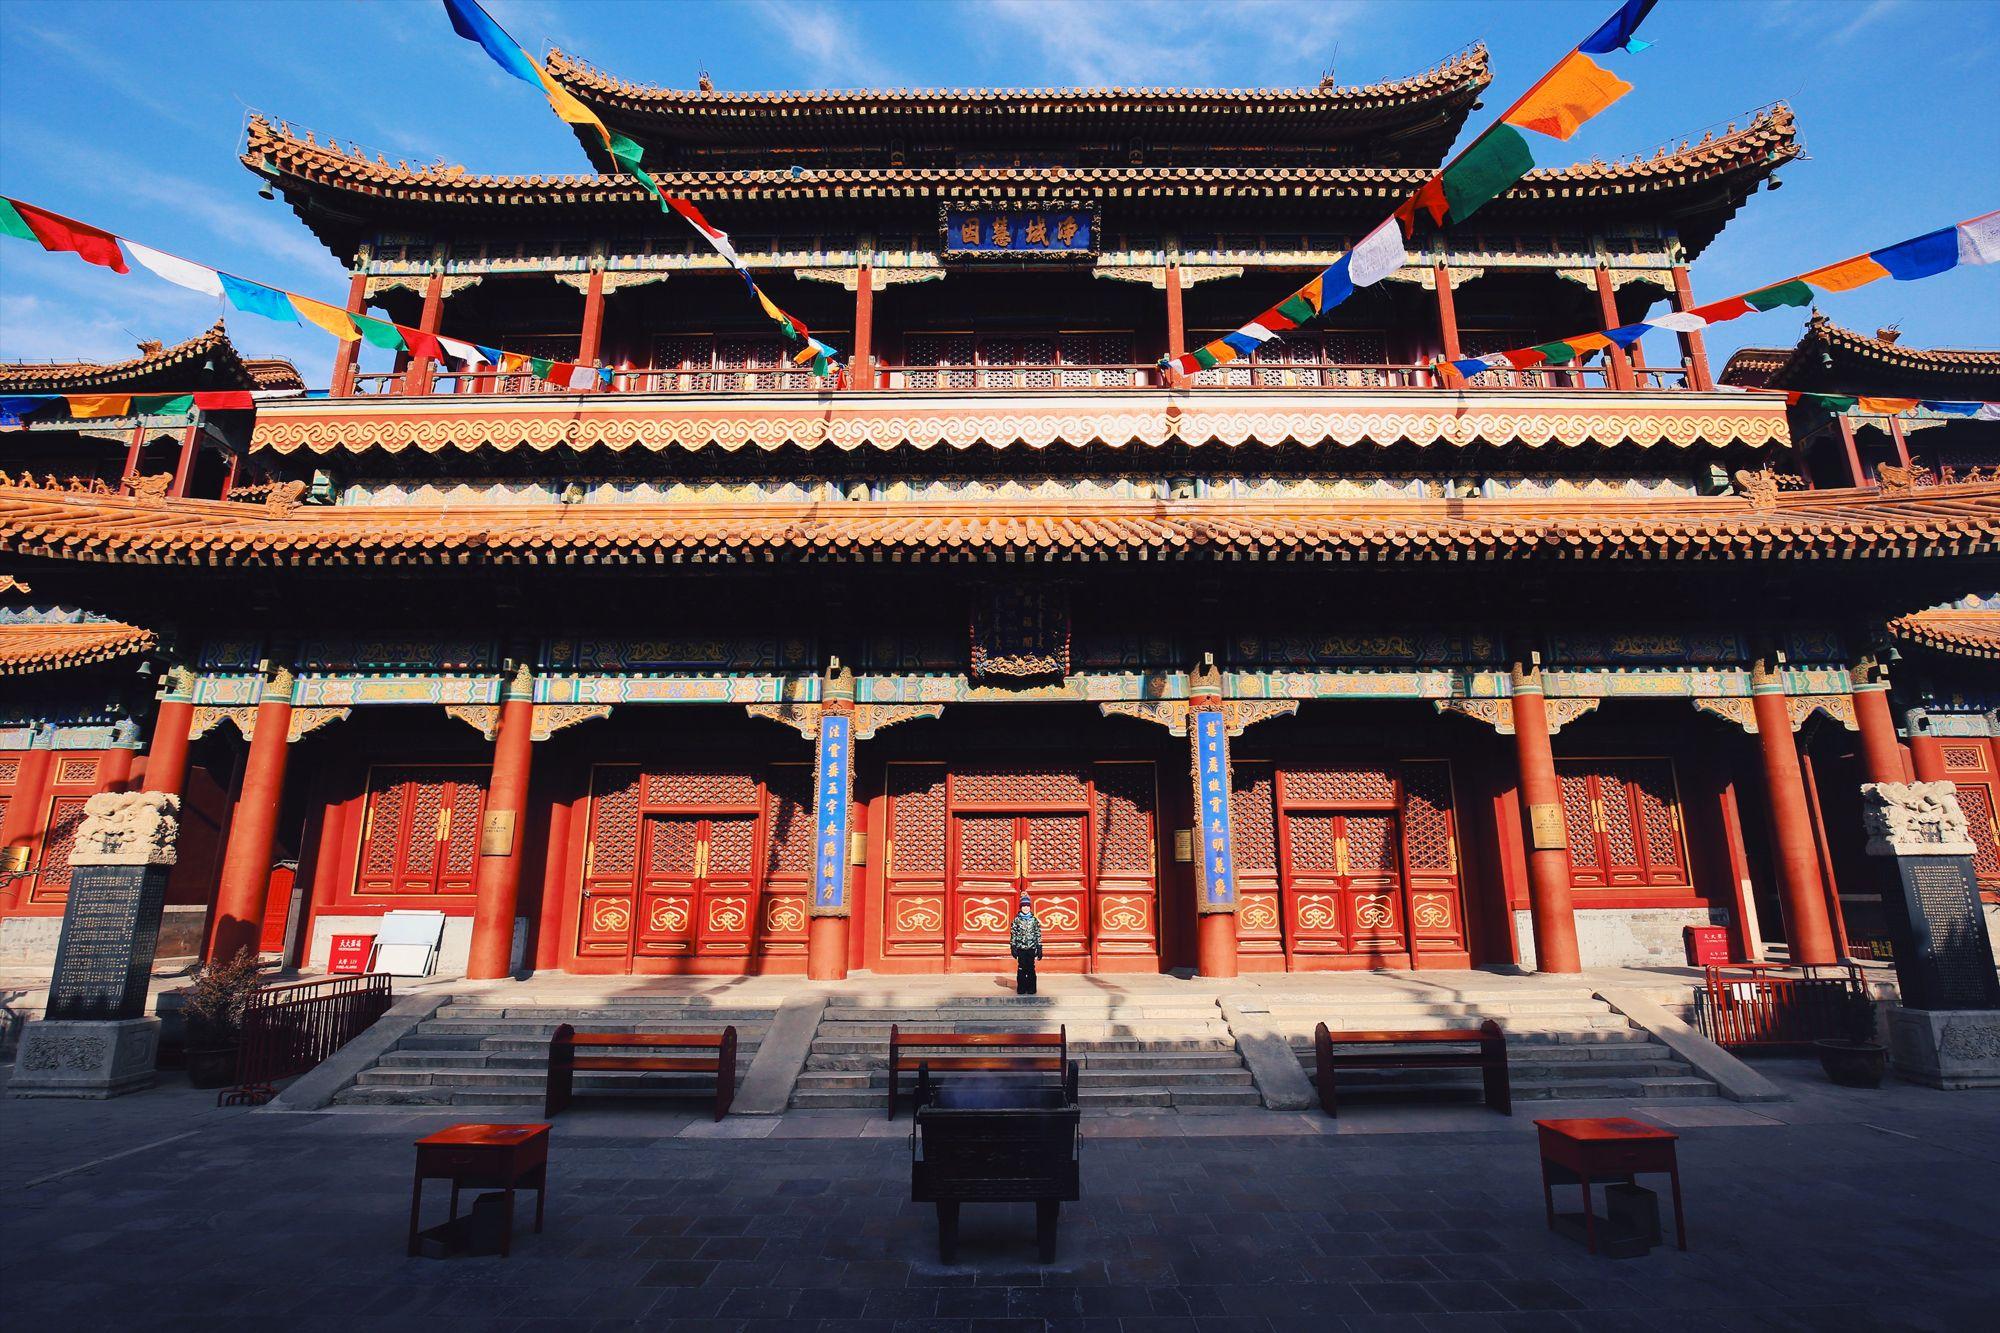 Beijing rencontres Expat sites de rencontres Johannesburg